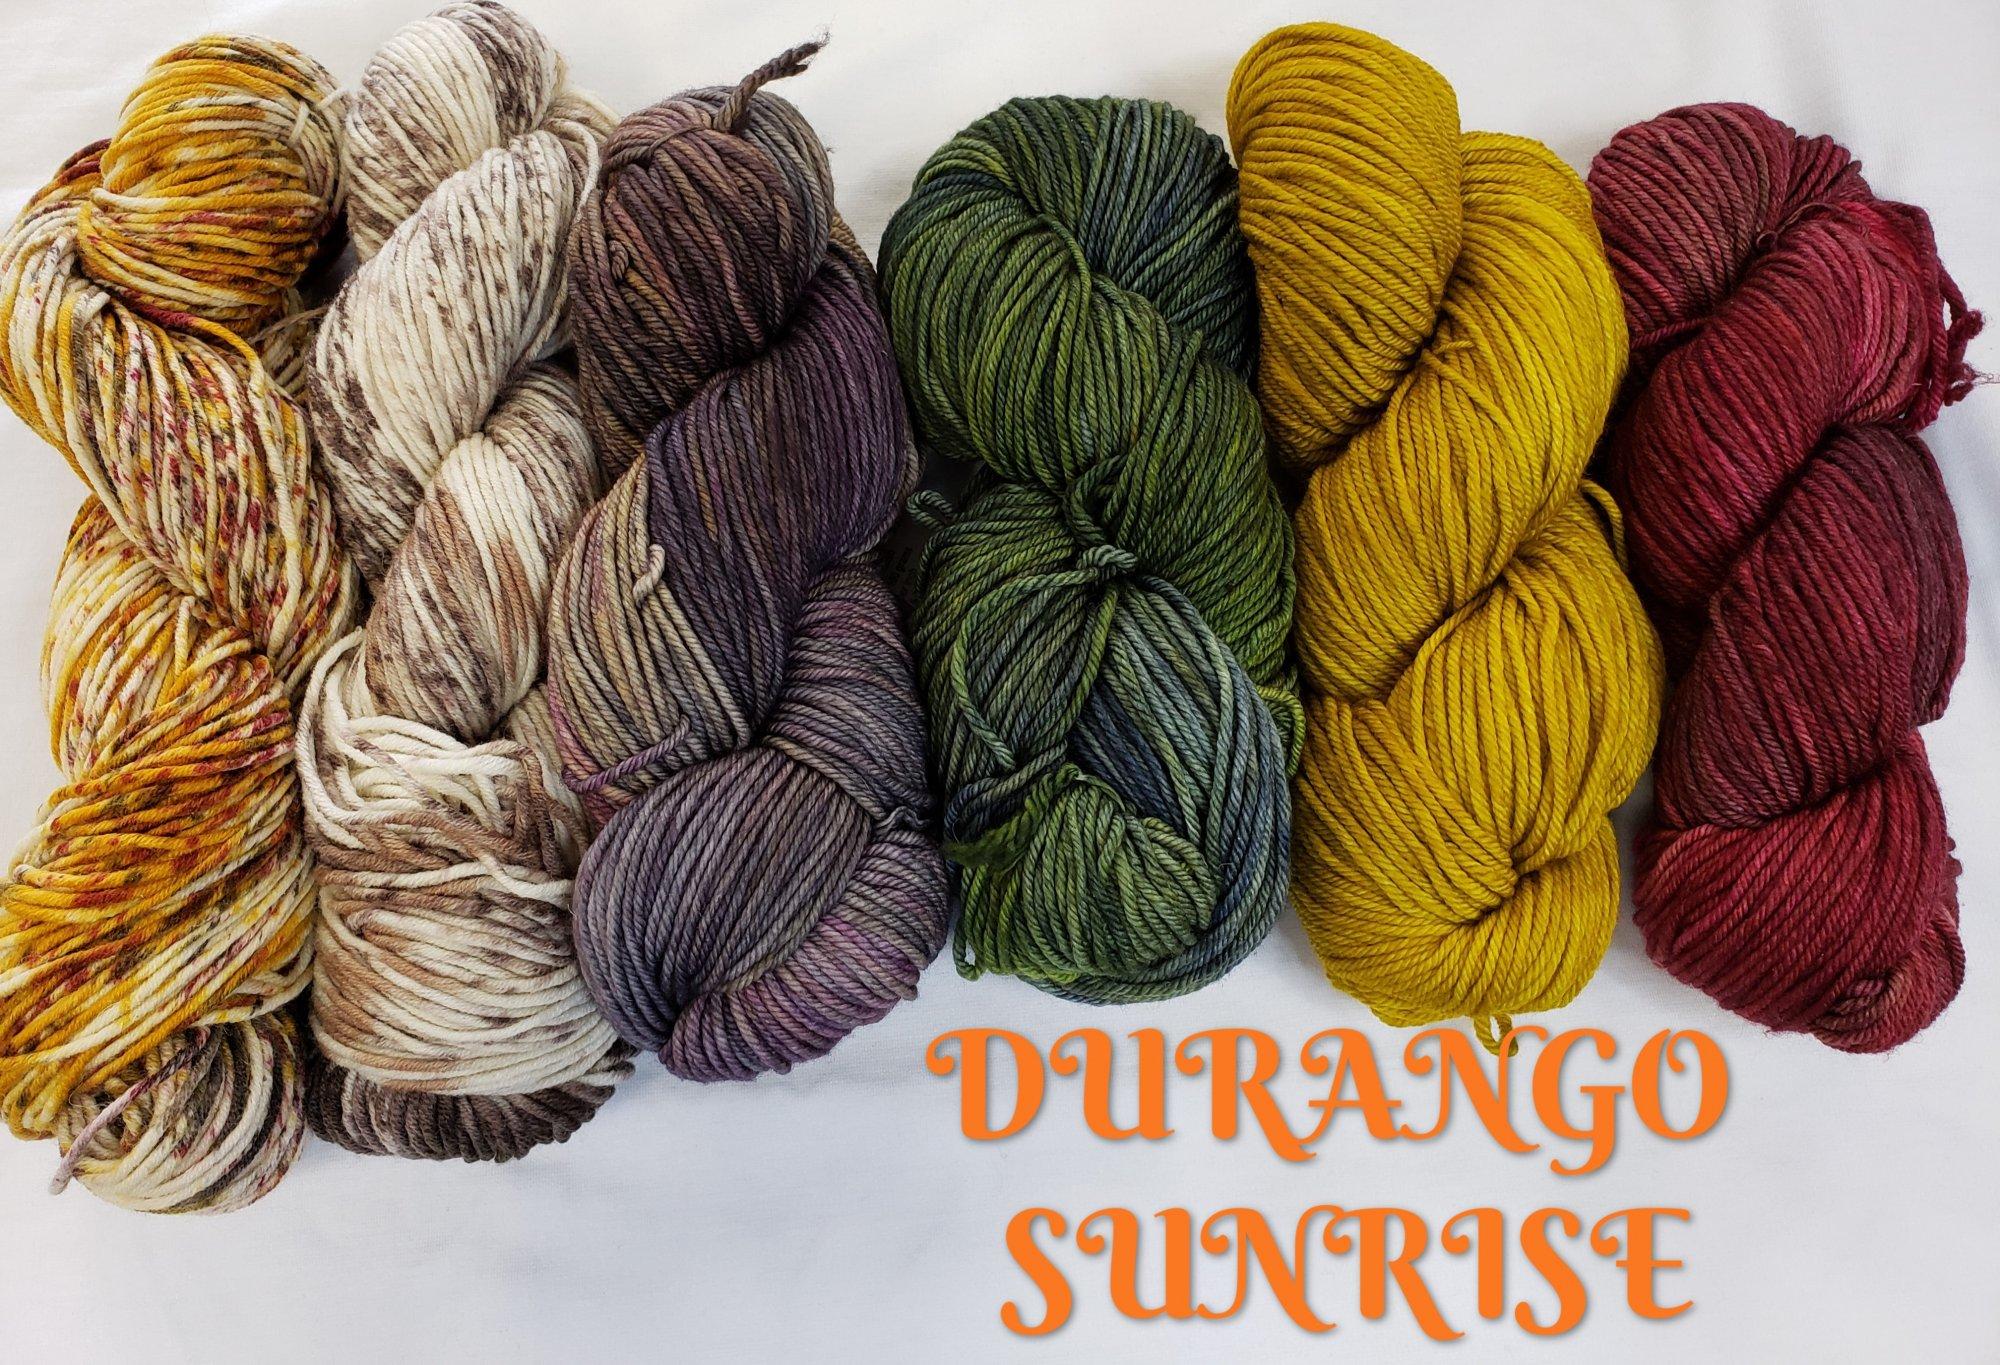 NIGHTSHIFT SHAWL SET - DURANGO SUNRISE